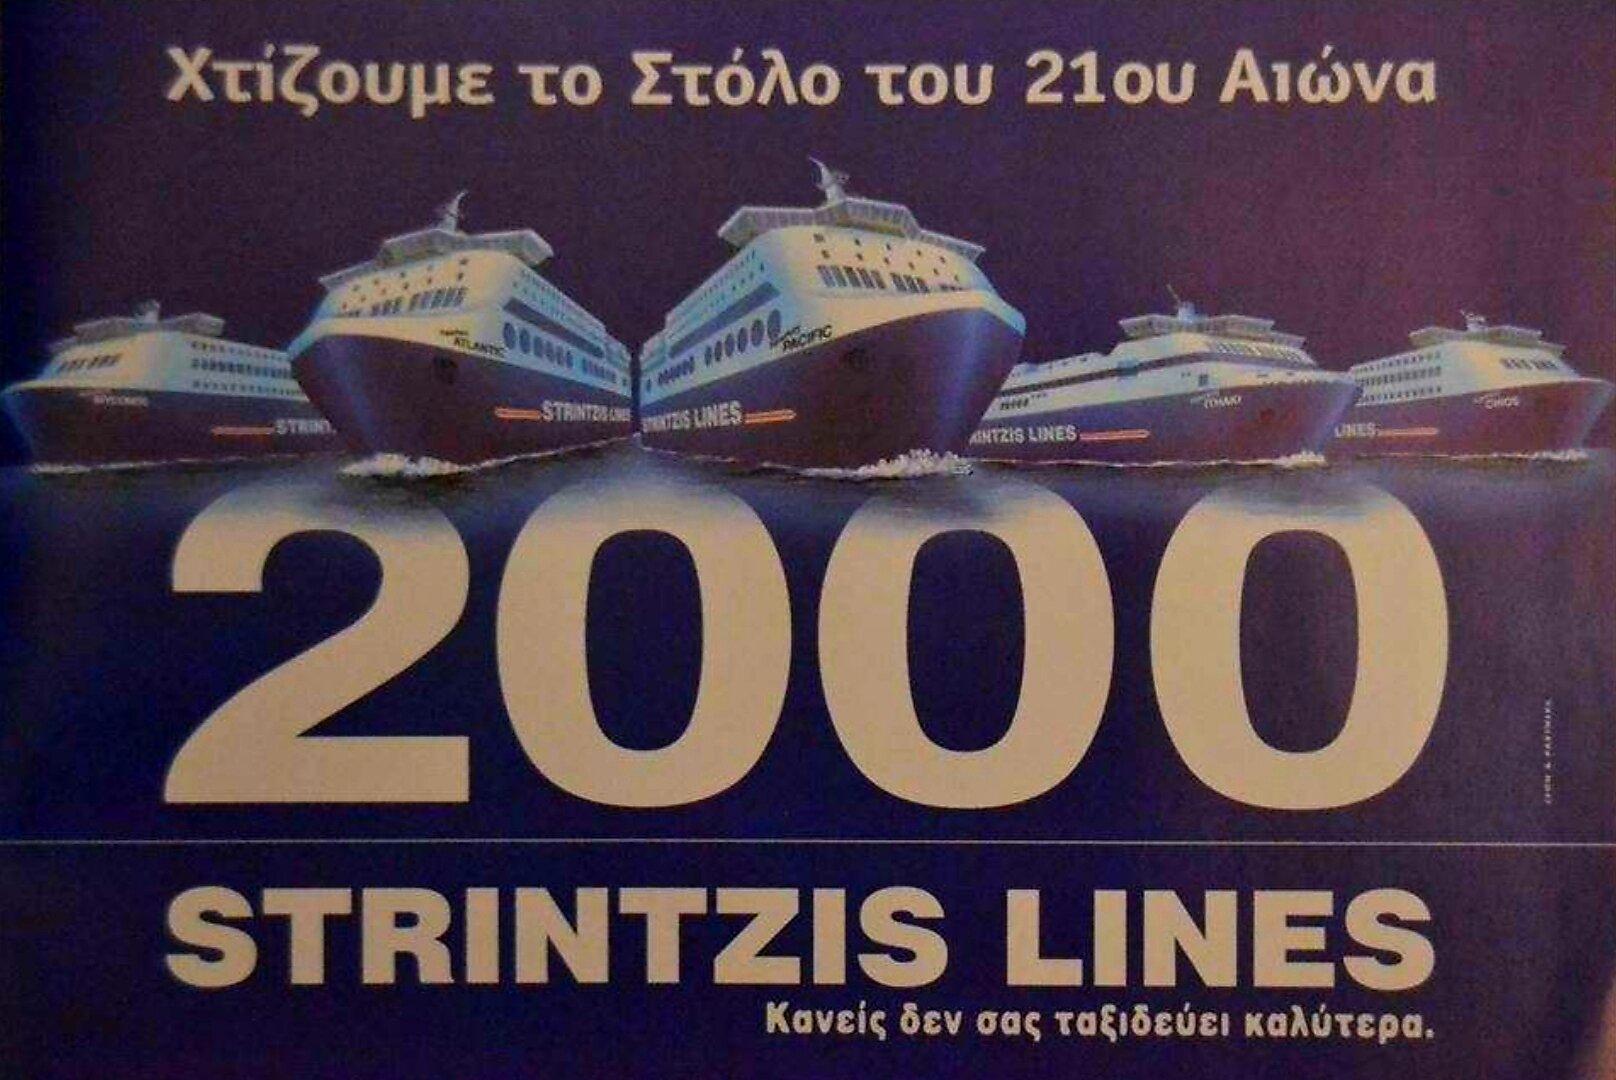 Strintzis lines newbuilding